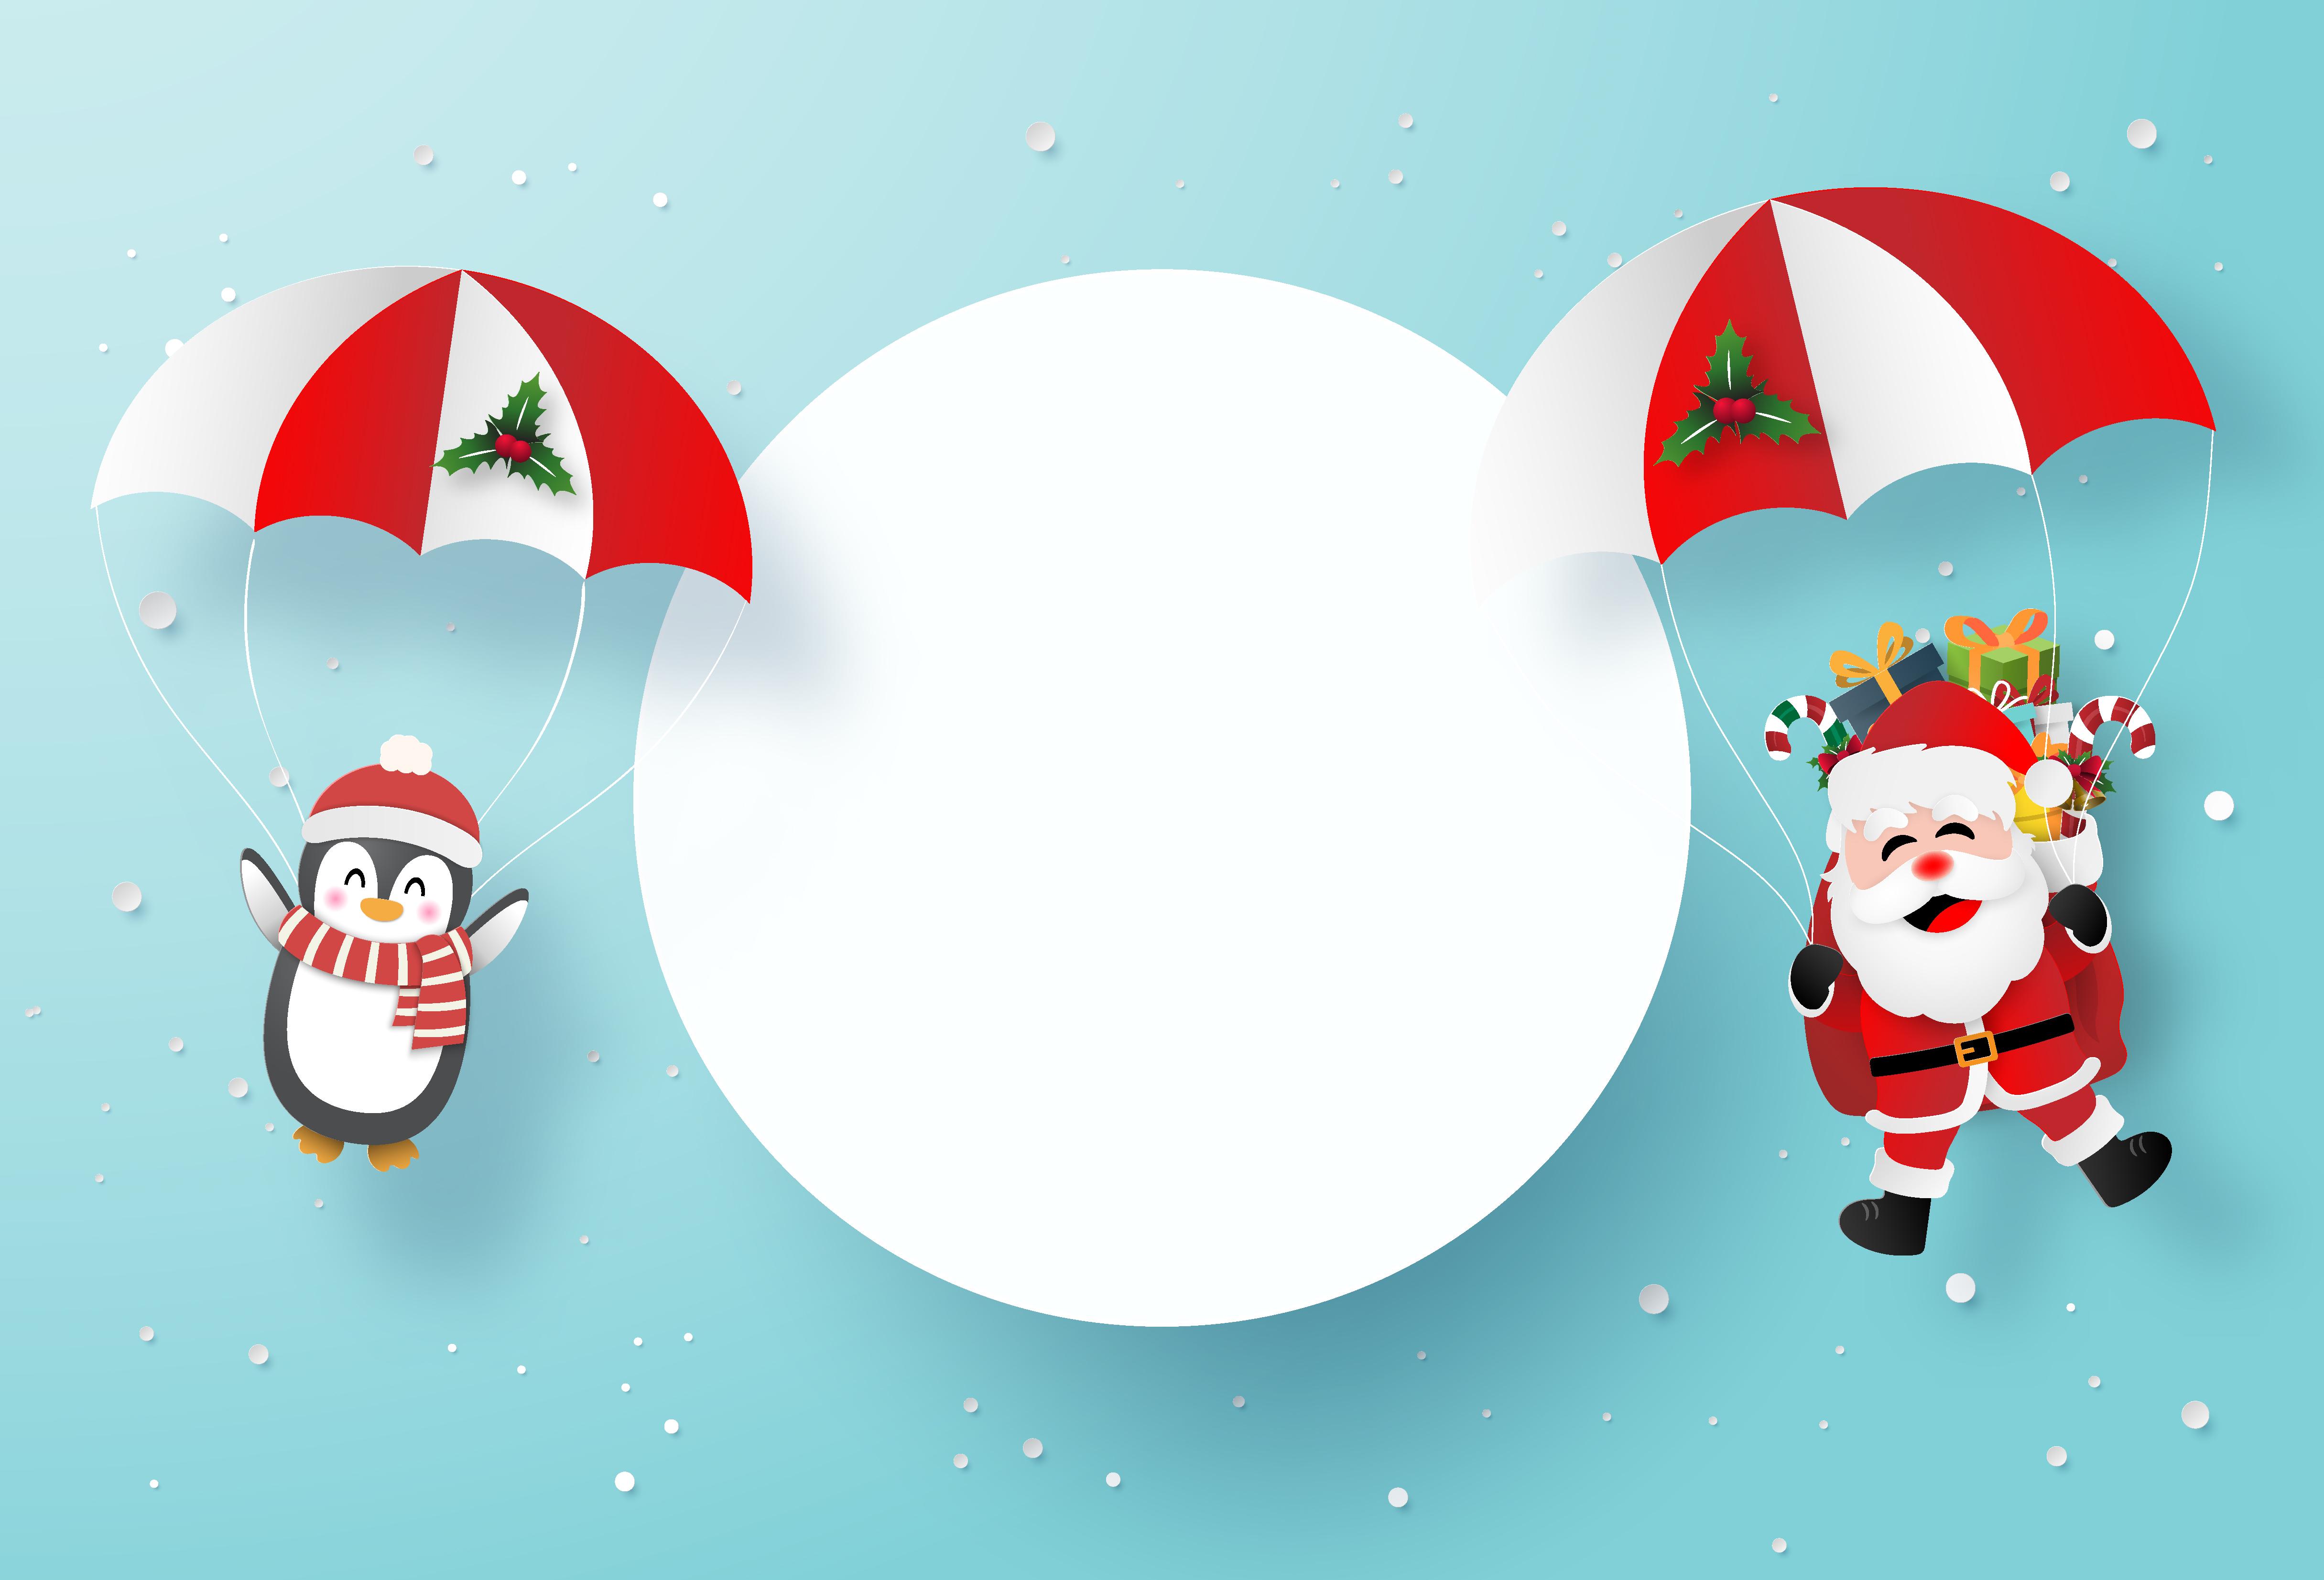 How to Make a Cute Origami Santa | 3306x4862